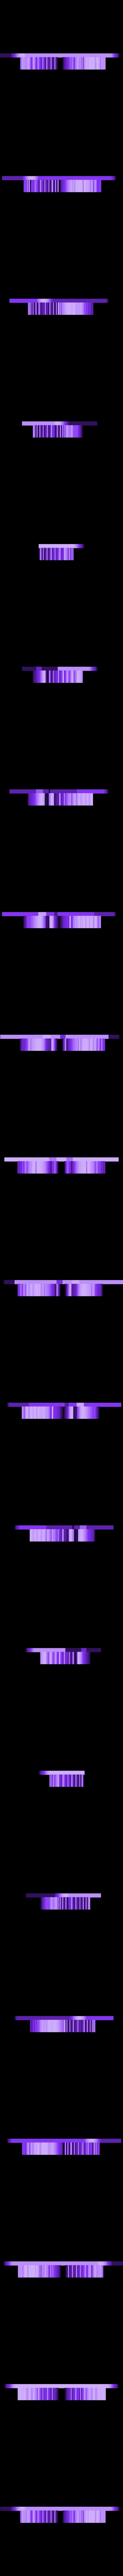 TAZ_5_Raspberry_Pi_3_Mount_-_Pi_Logo_Green.stl Download free STL file TAZ 5 Raspberry Pi 2 / 3 Main Box Extension • 3D print template, crprinting